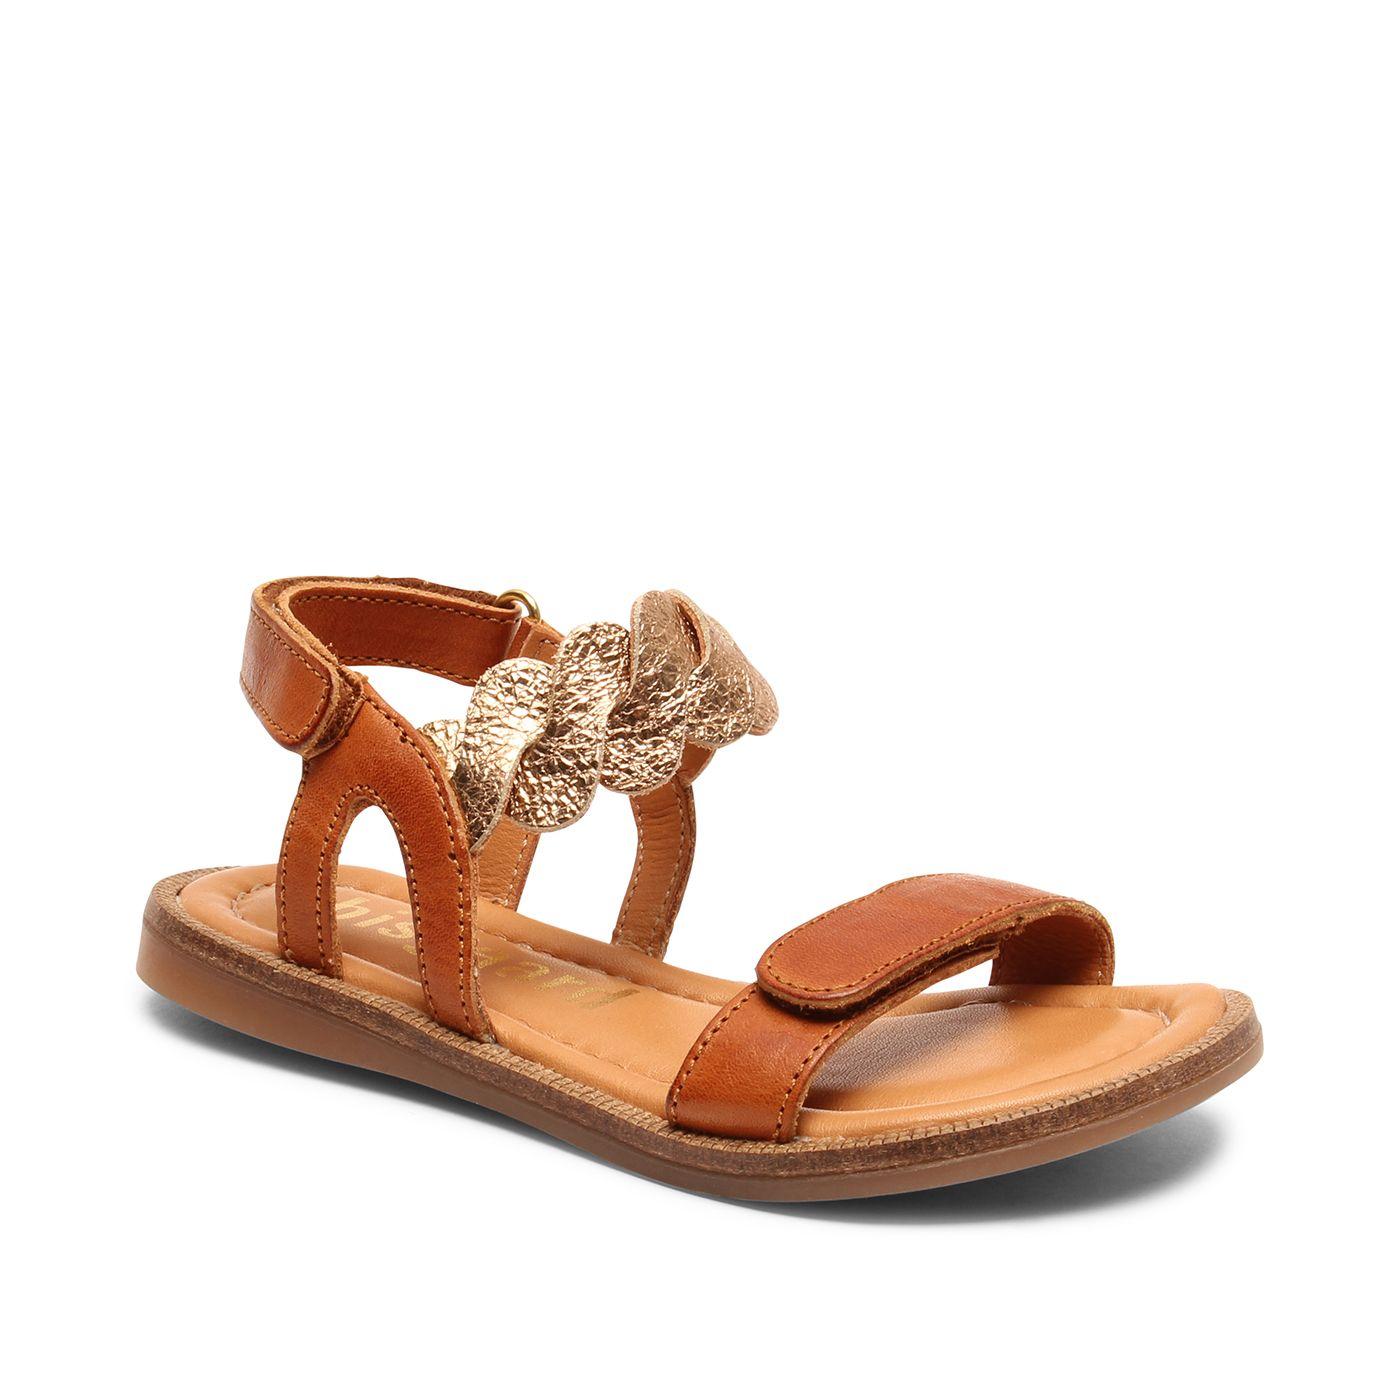 Bisgaard dívčí kožené sandály 71945 - 1300